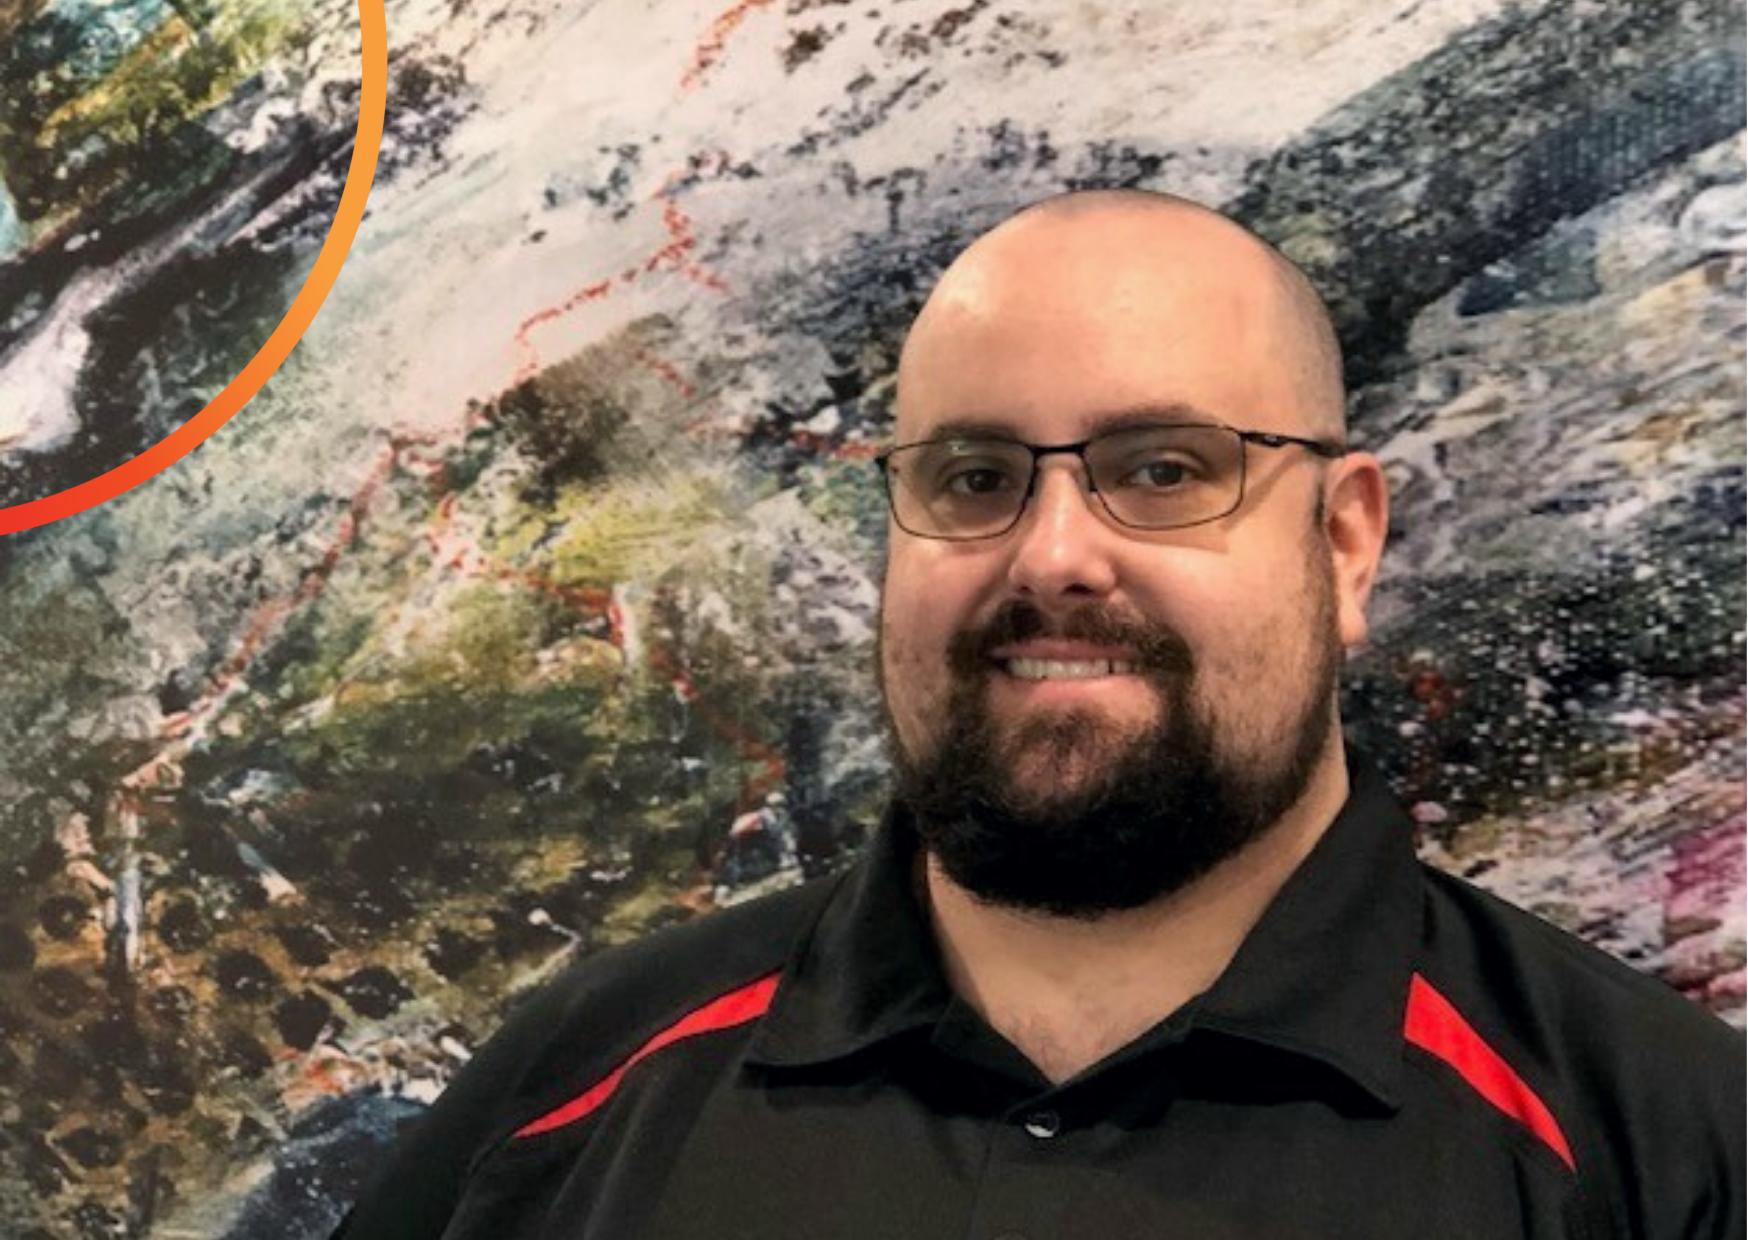 Meet our Systems Engineer - Drew Paczynski